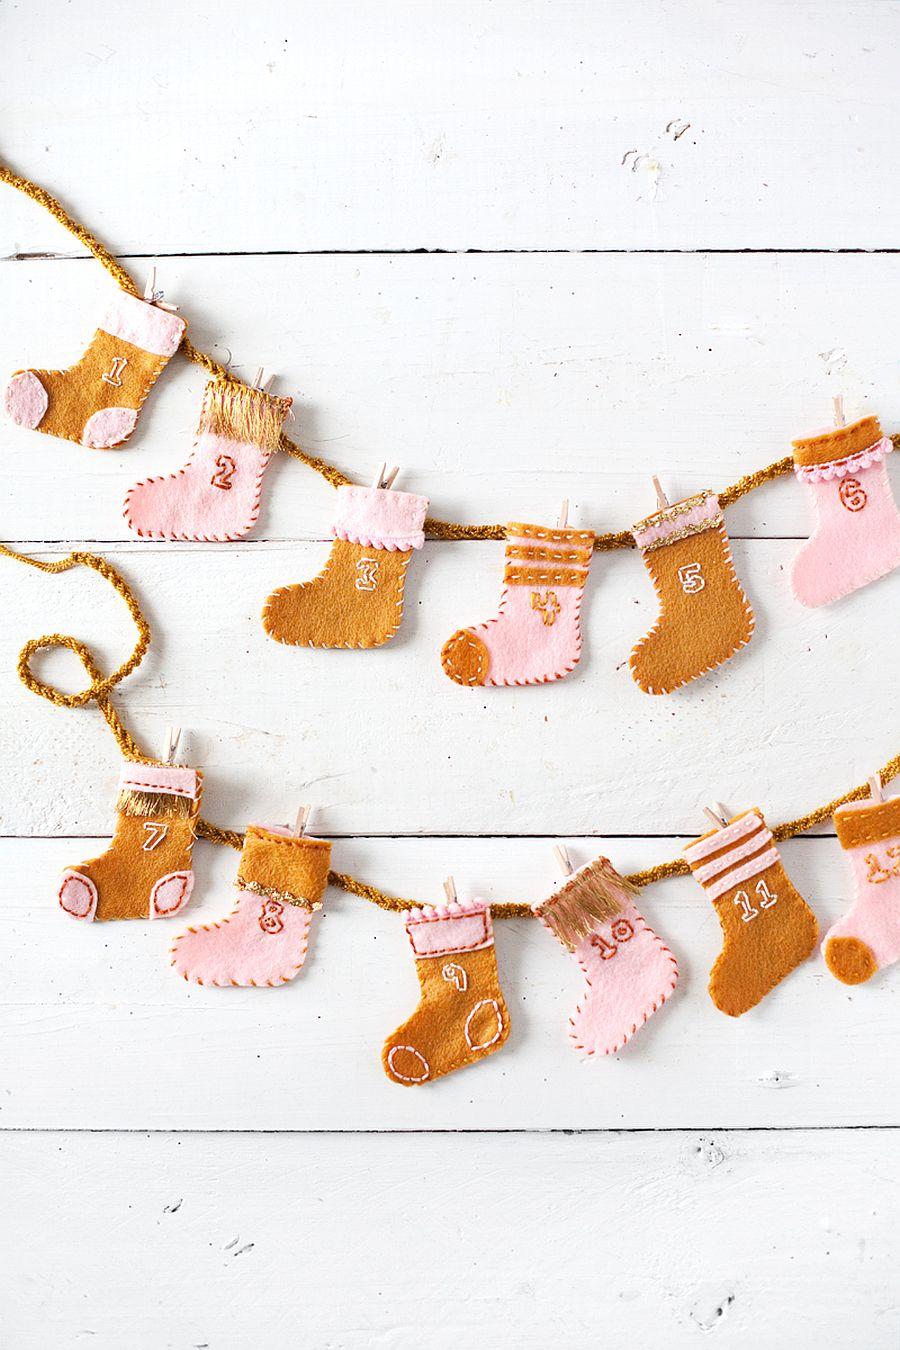 Advent-Stocking-DIY-Garland-for-Christmas